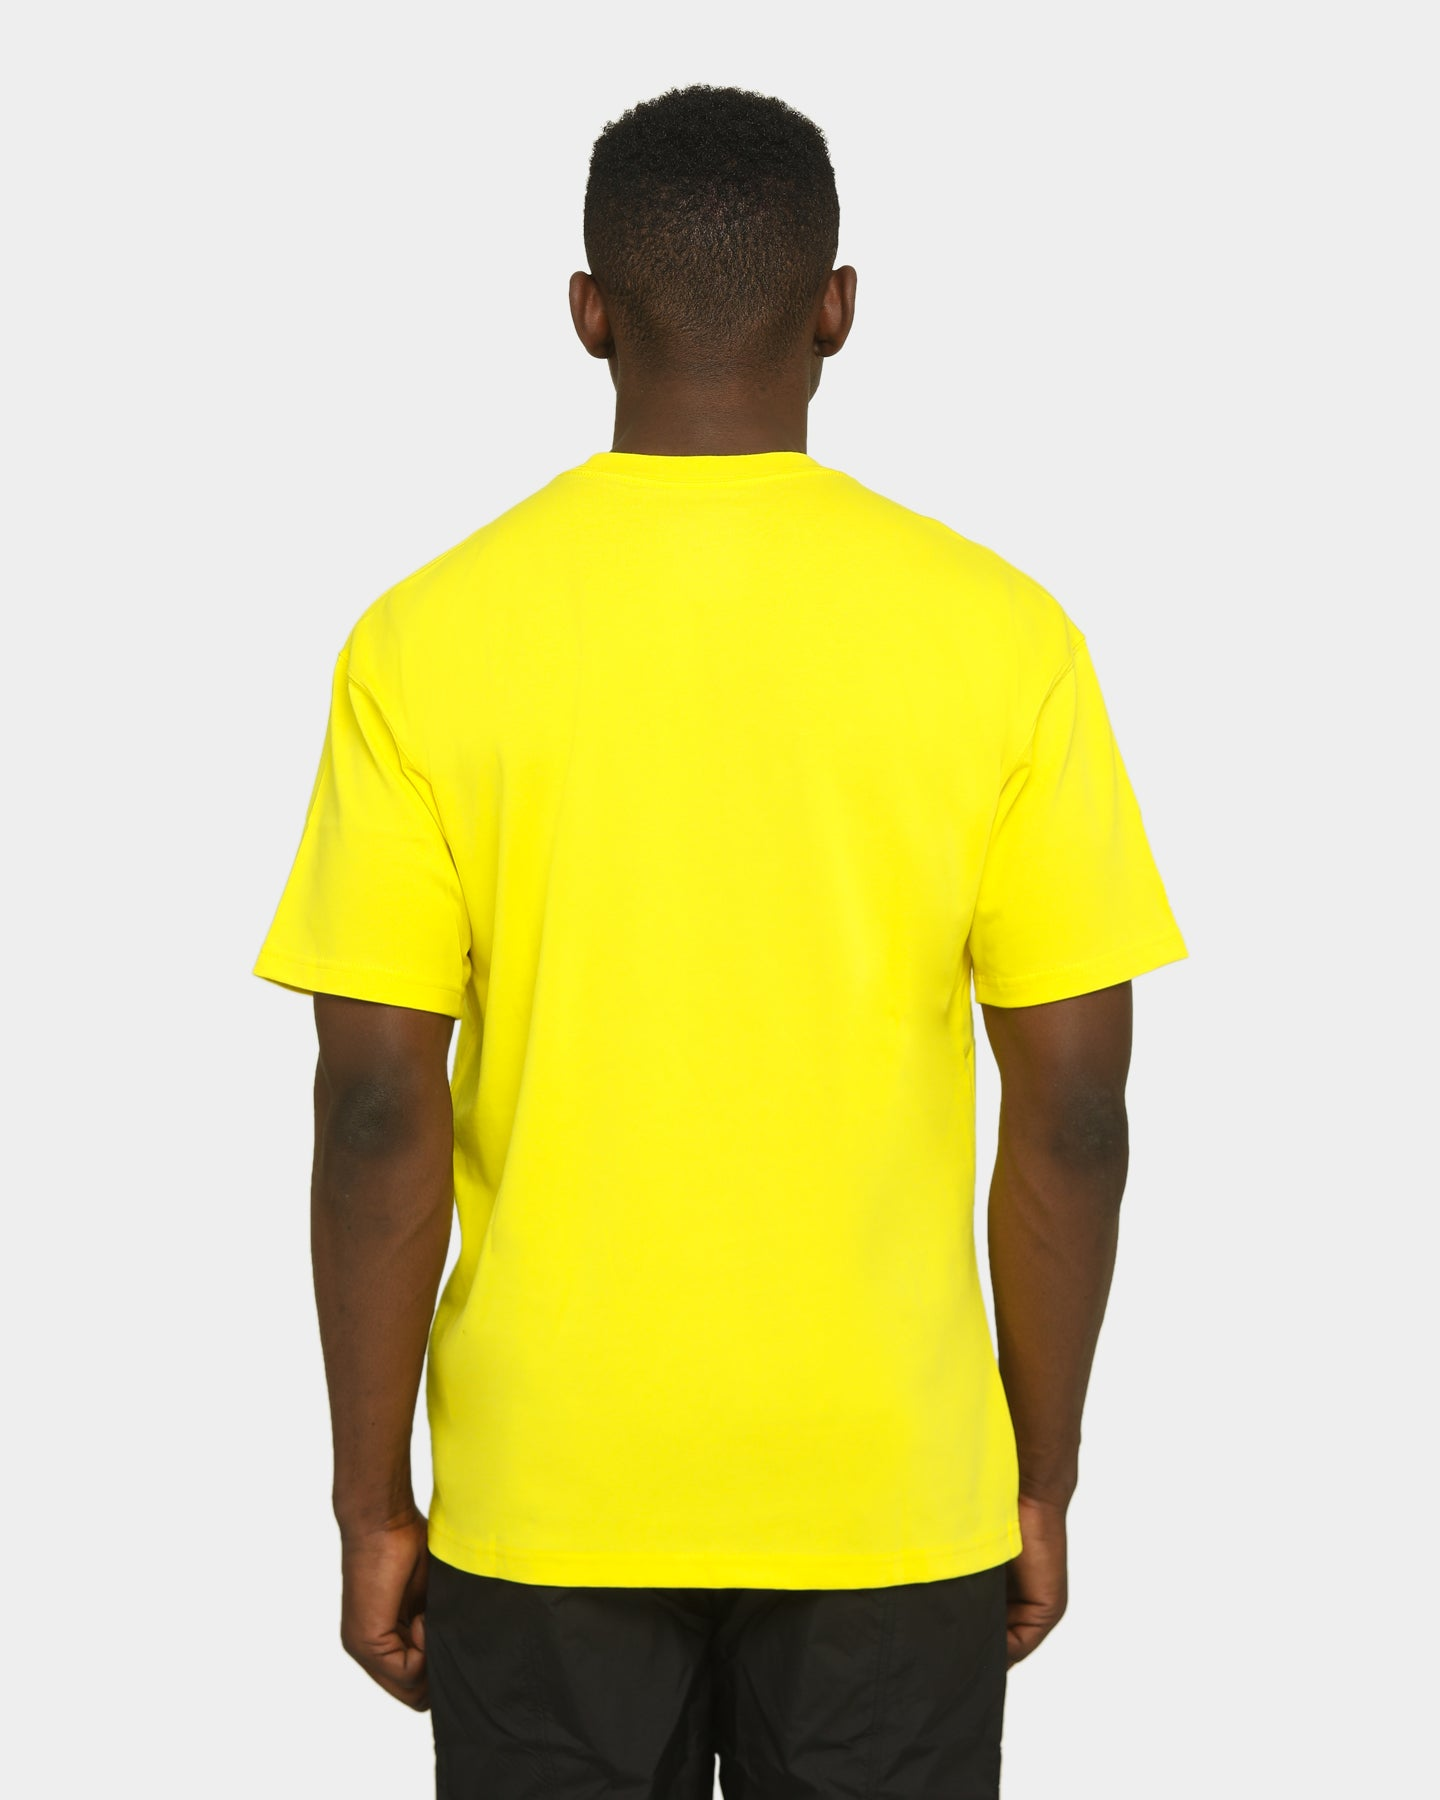 Nike Men's Air Max 90 Short Sleeve T